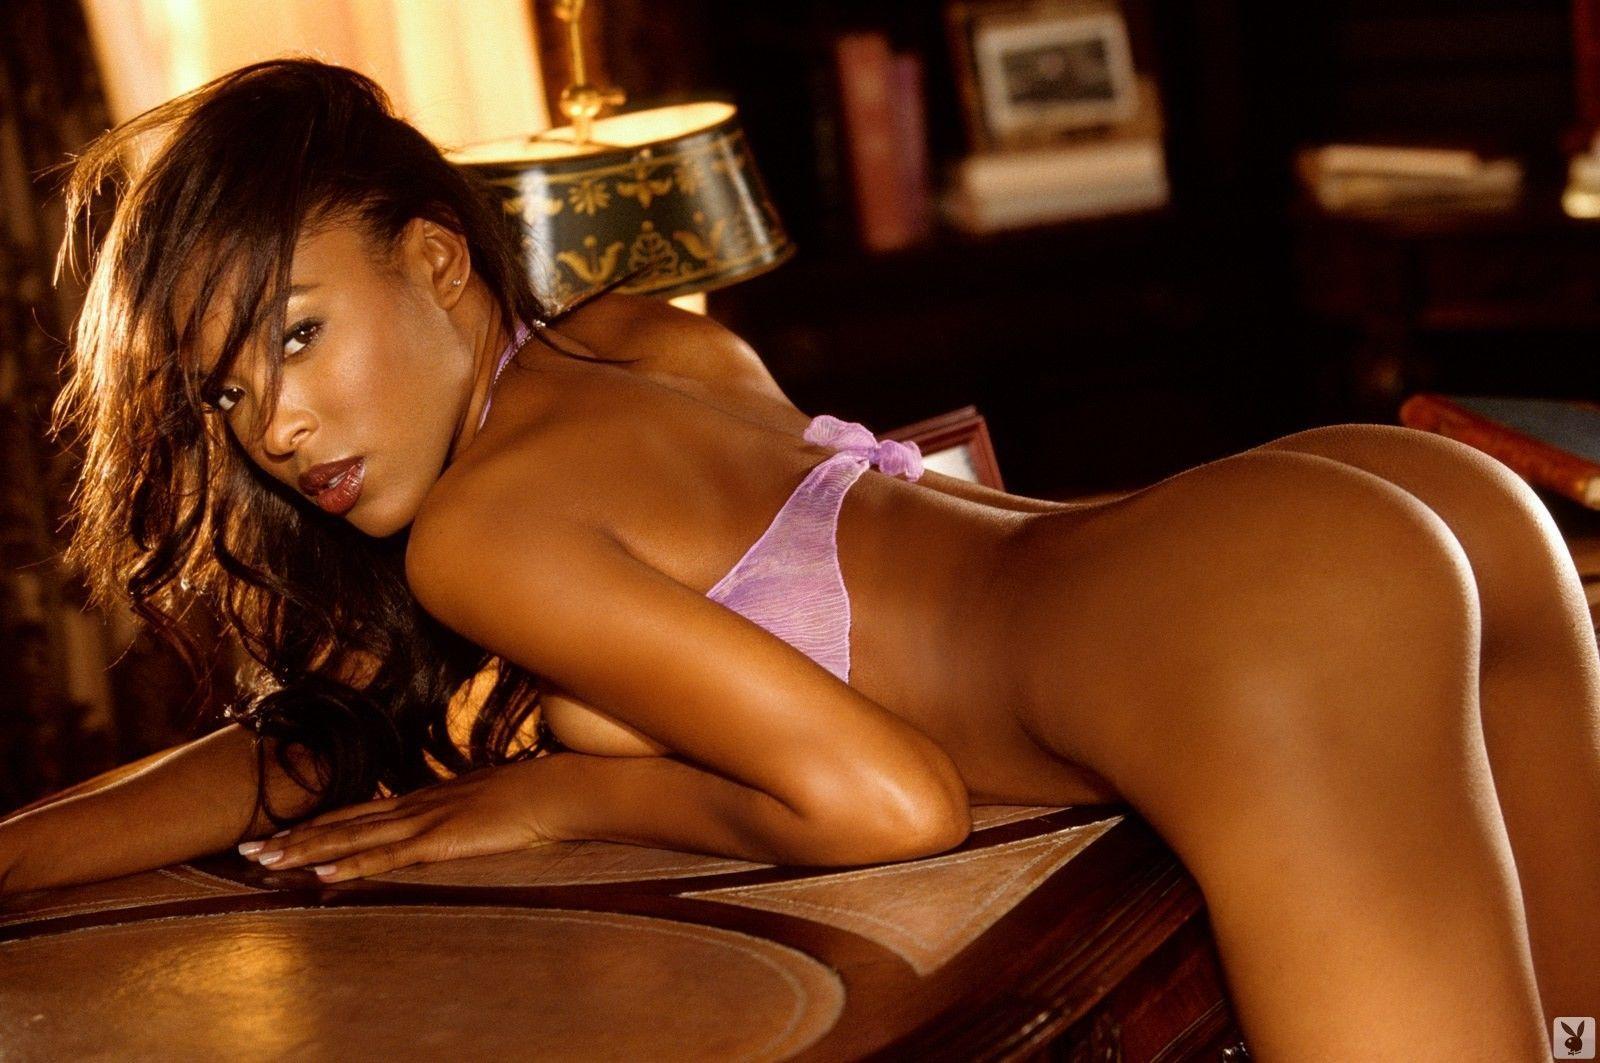 Ebony playboy girl naked